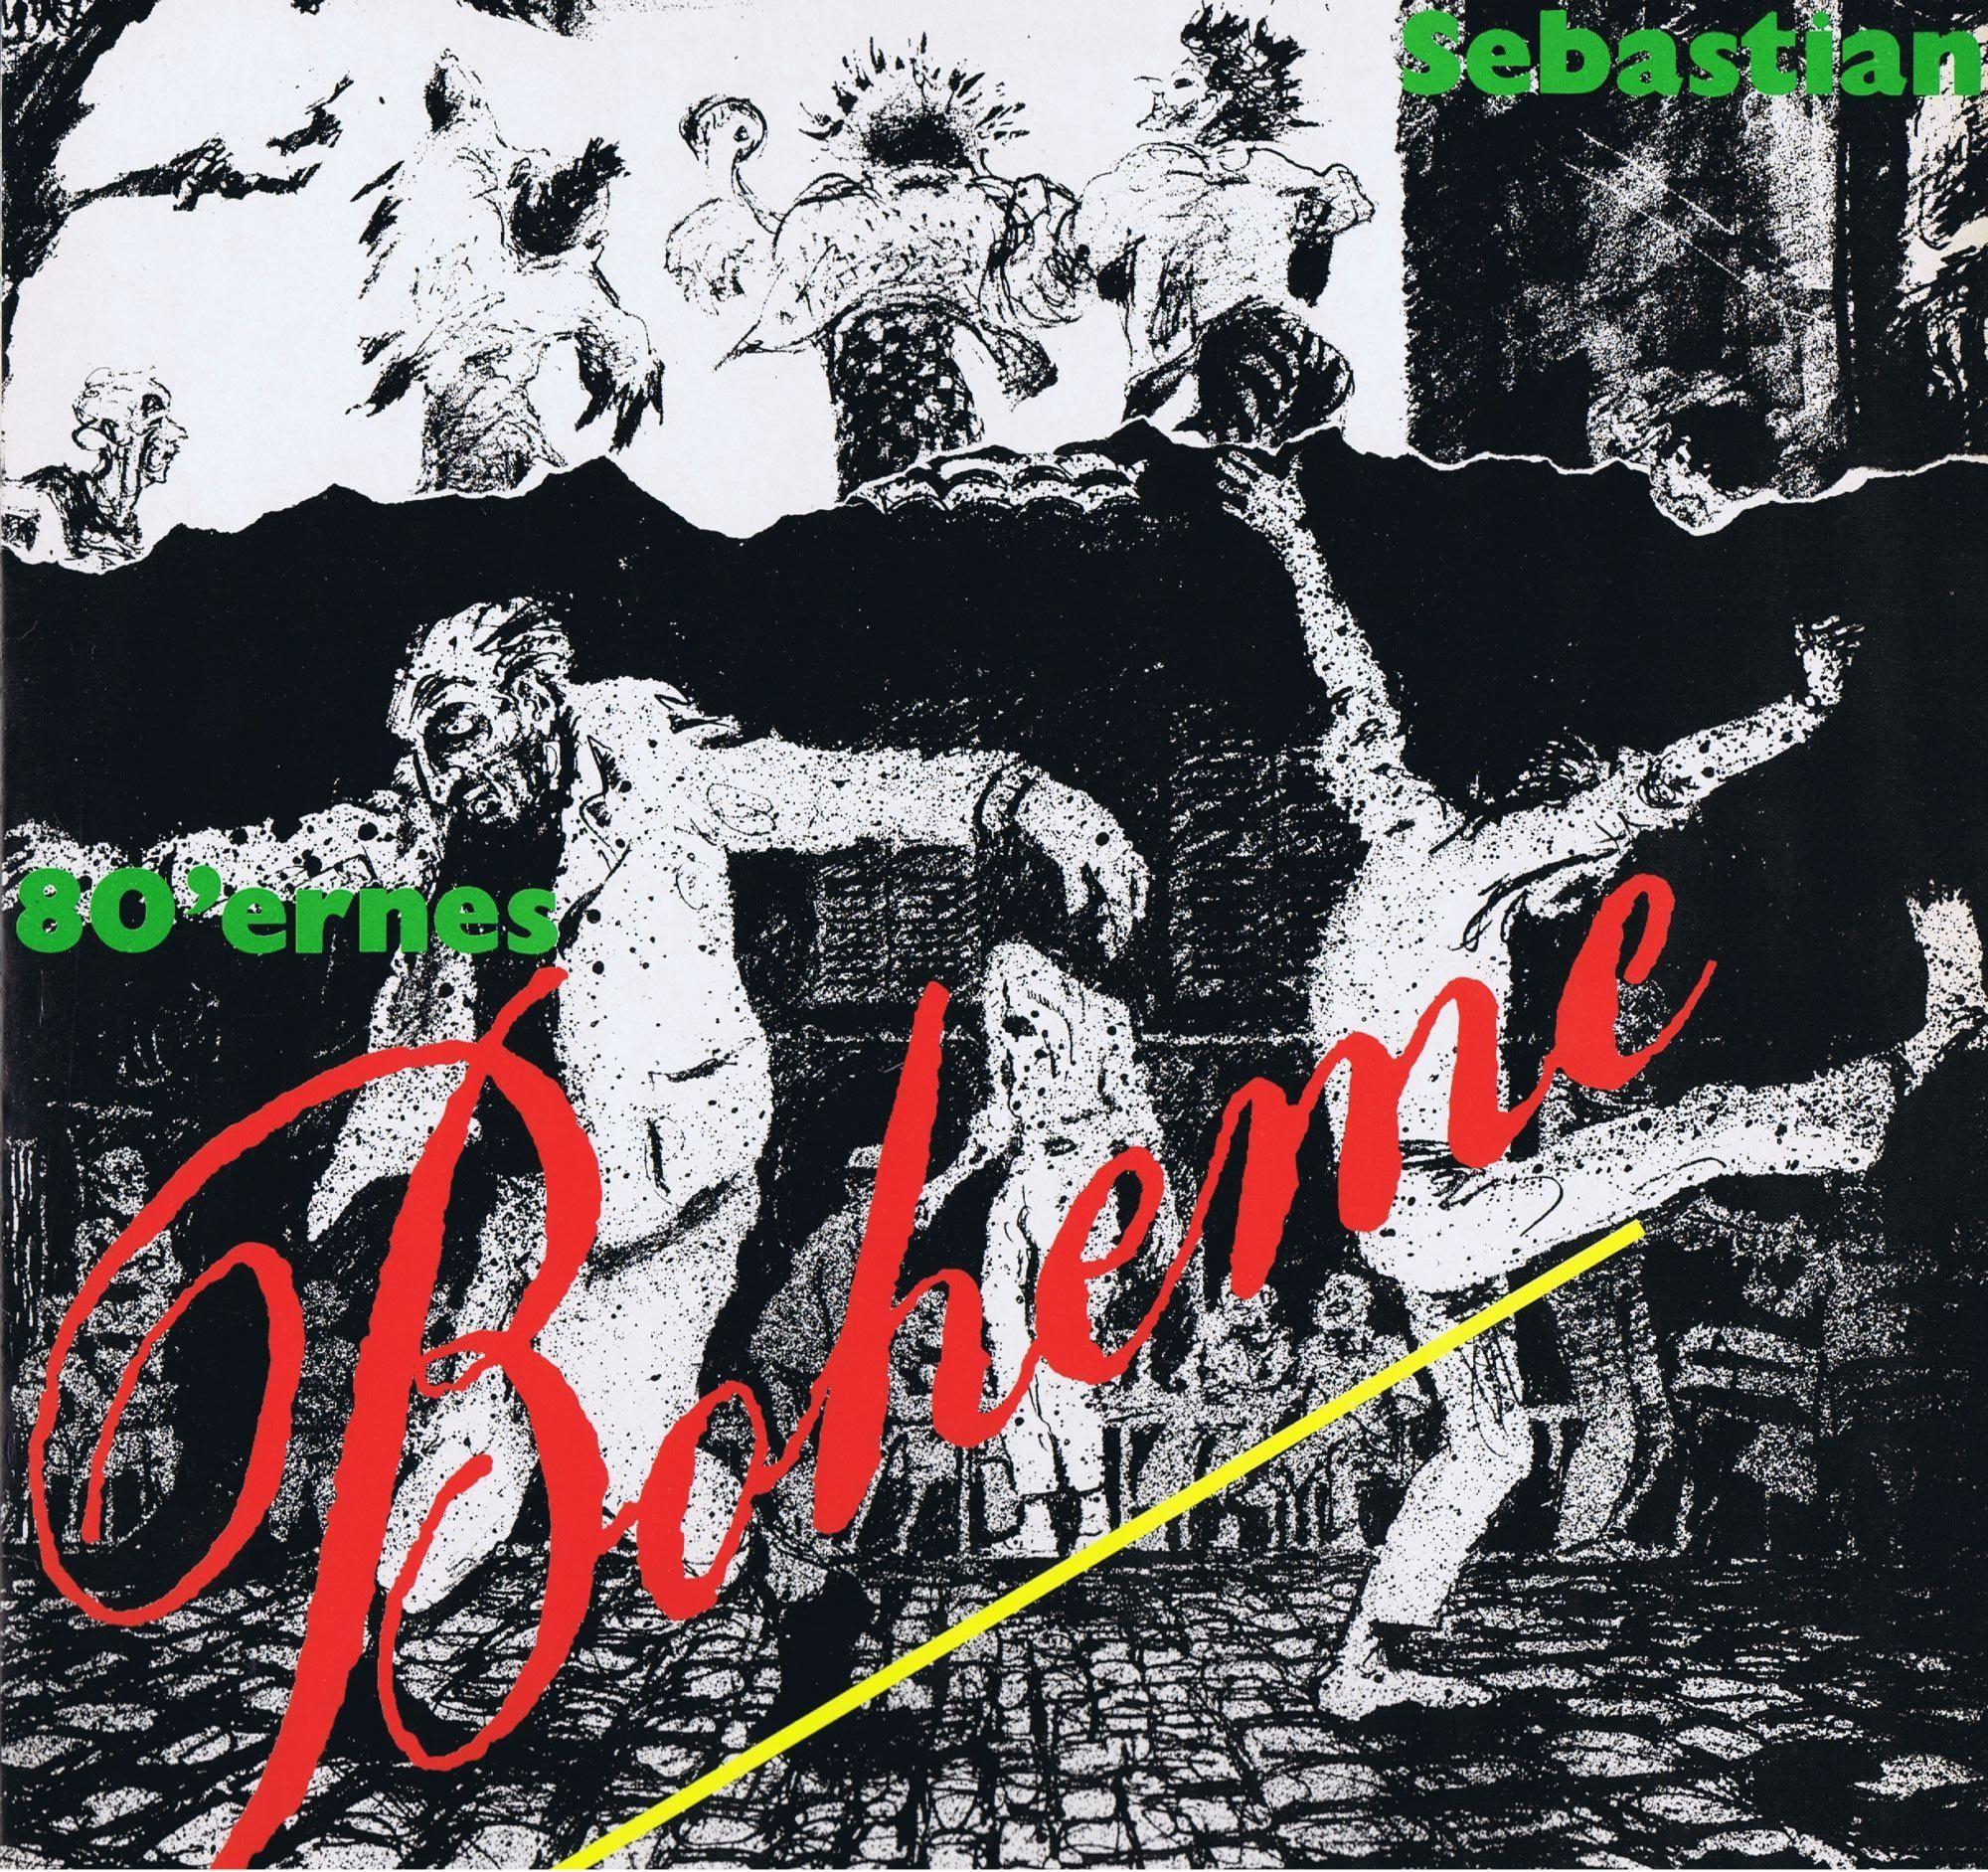 80'ernes Boheme [Signeret] - Sebastian - Musik -  - 7332181092684 - 29/11-2019